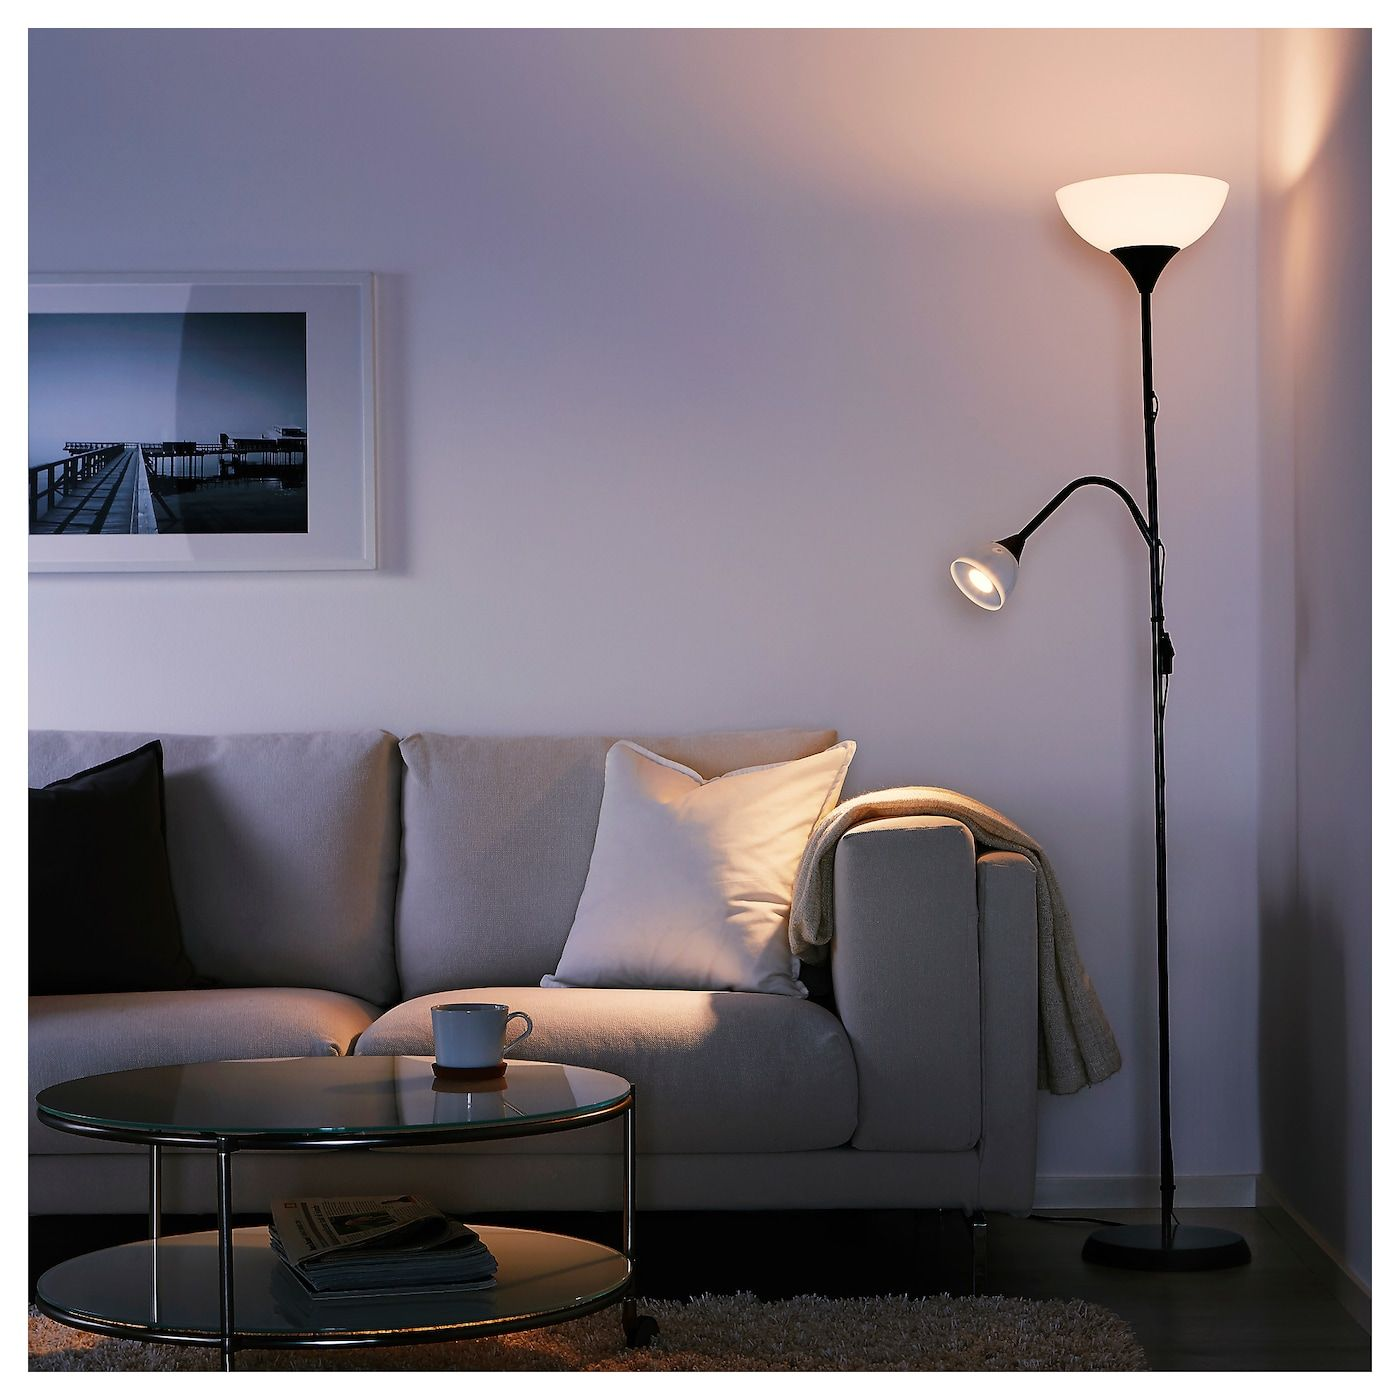 ikea floor reading lampadaire lamp lamps liseuse uplighter avec deckenfluter leseleuchte lampadaires luminaires holmo sweden luminaire bain salle shopee lampu